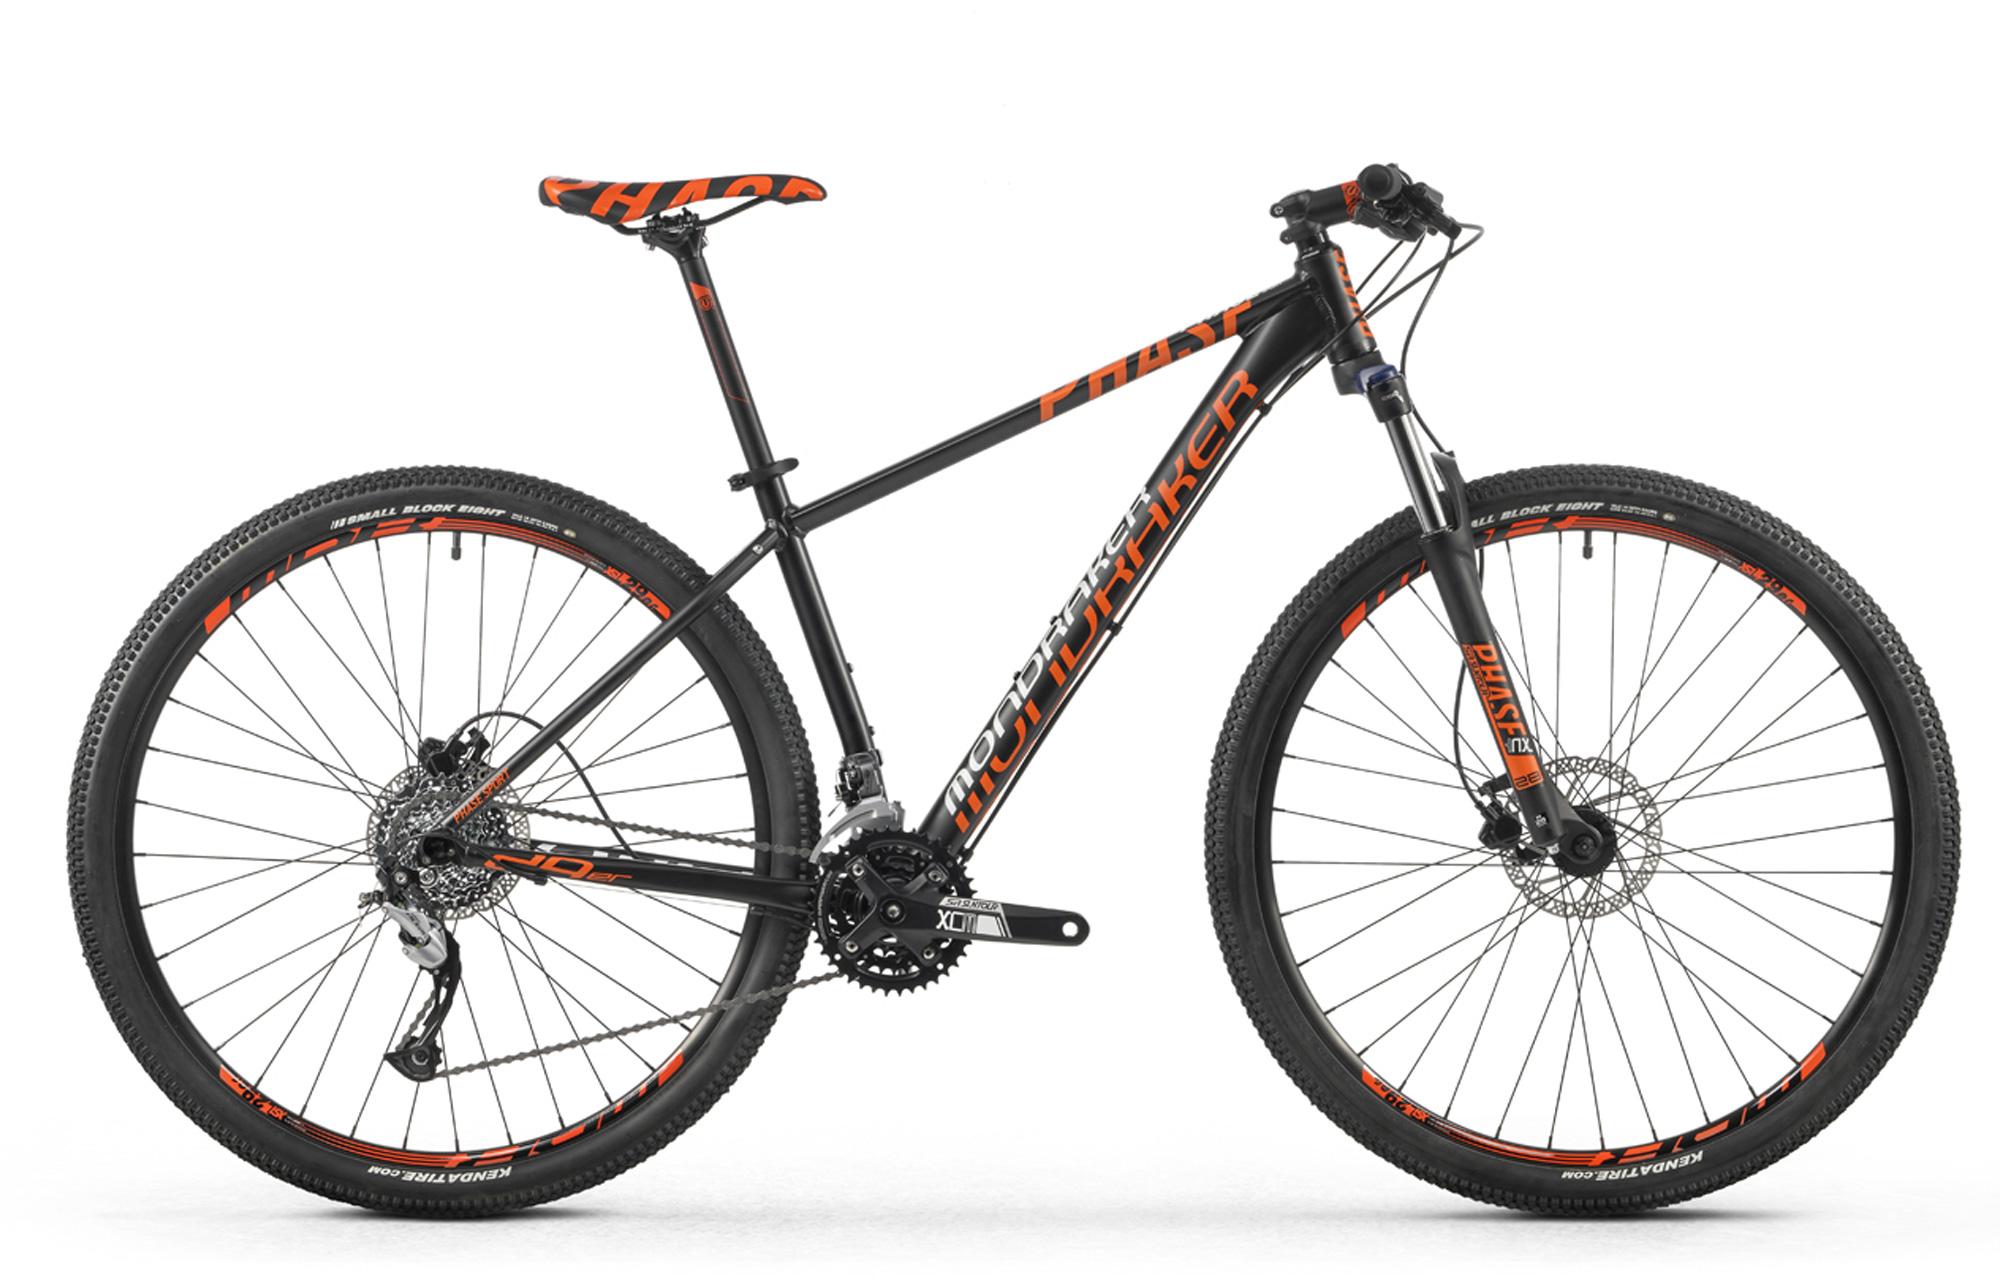 Bicicleta MONDRAKER PHASE SPORT 29\'\' 2016 Negro Naranja | Alltricks.es